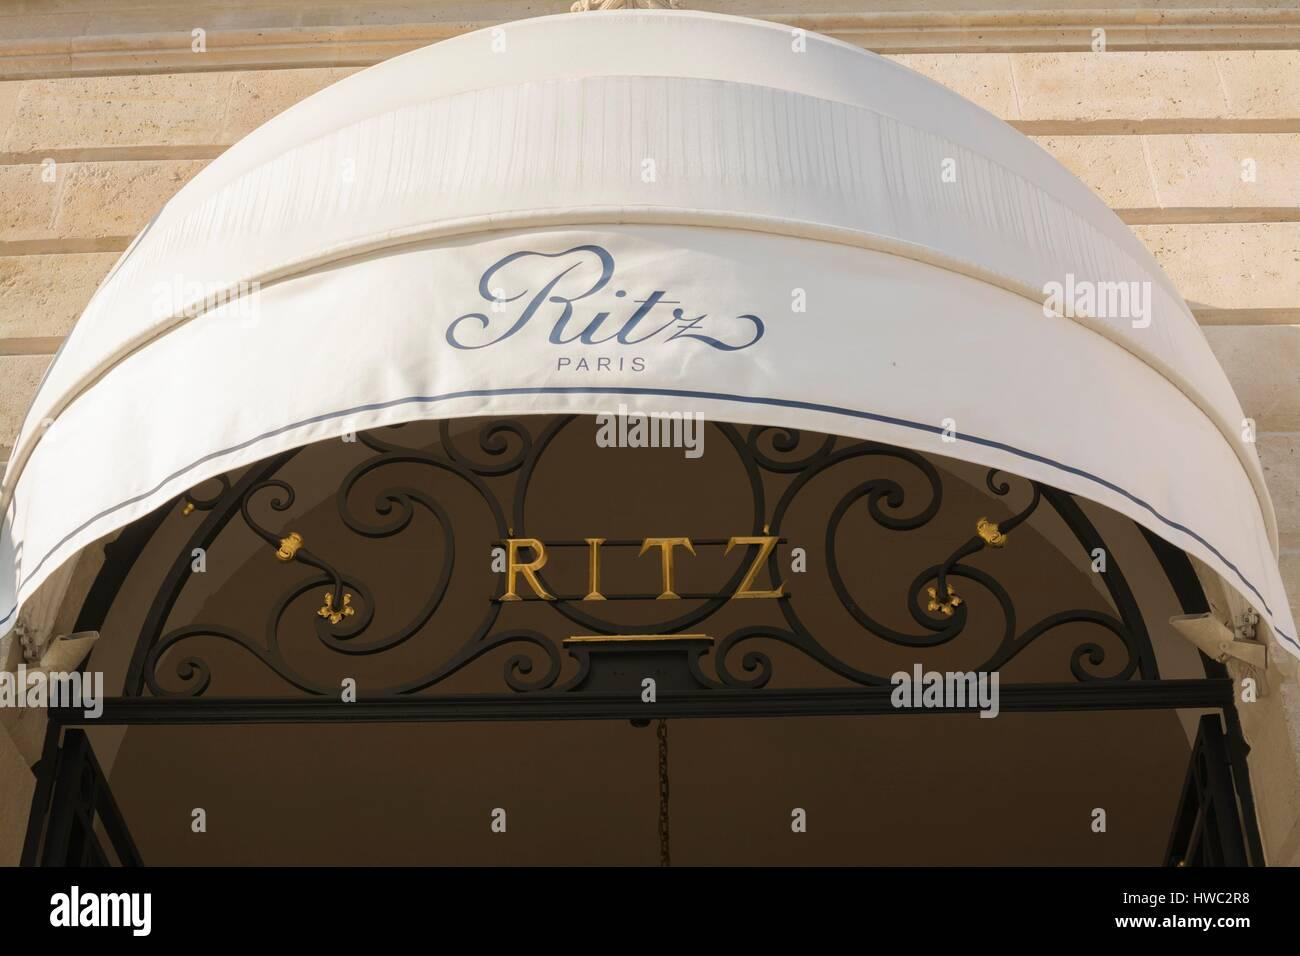 Ritz Hotel in Vendome Square, Paris, France - Stock Image